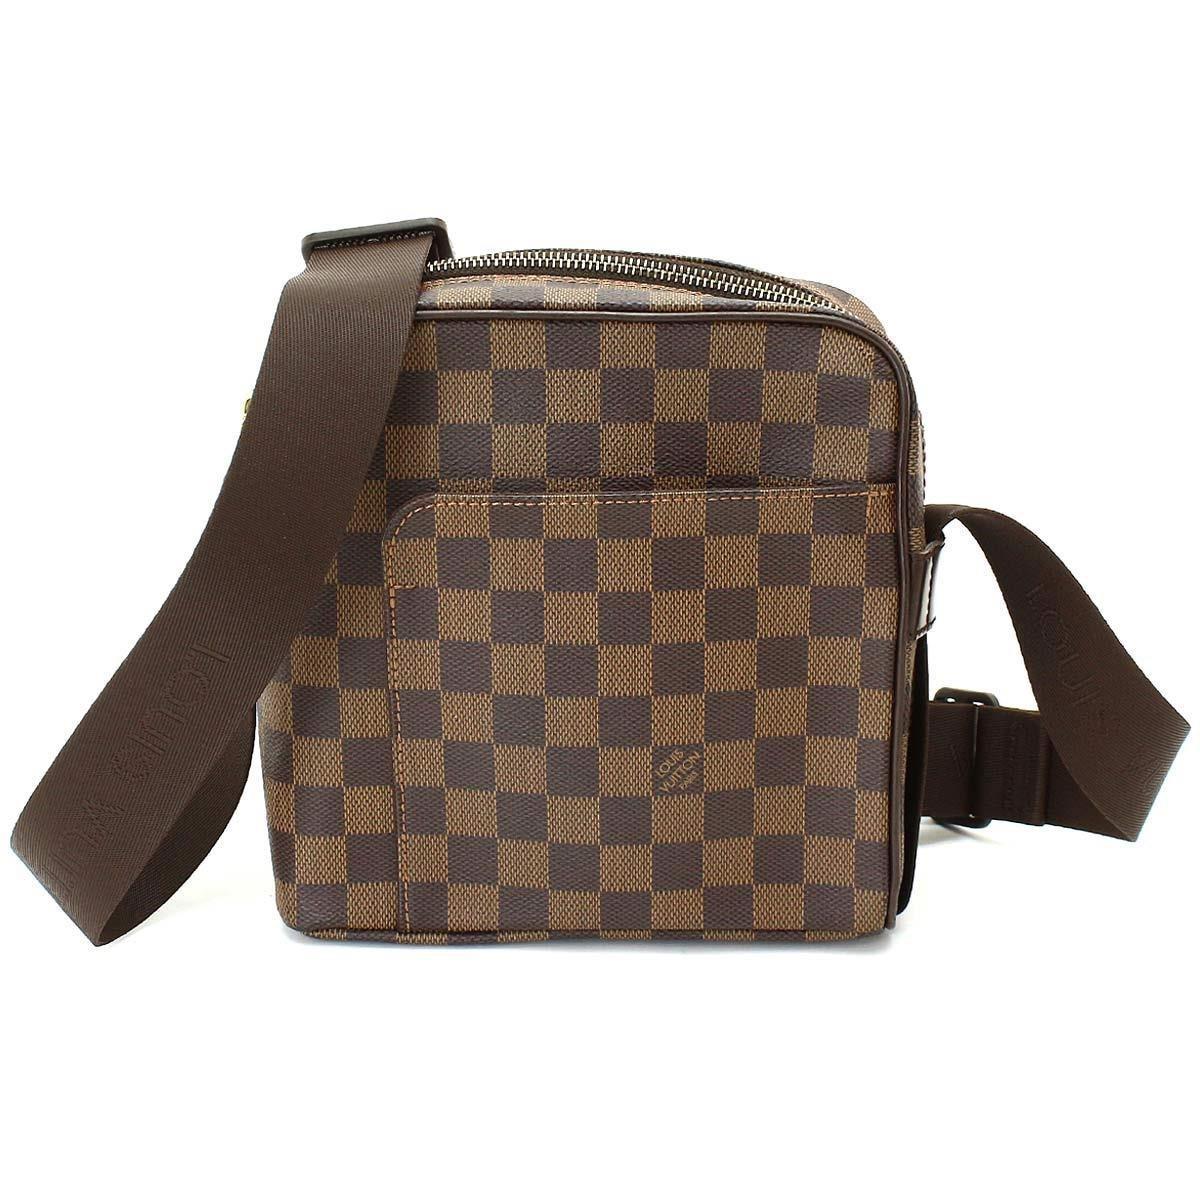 da1ce4e66095 Lyst - Louis Vuitton Damier Olav Pm Shoulder Bag Ebene N41442 Purse ...